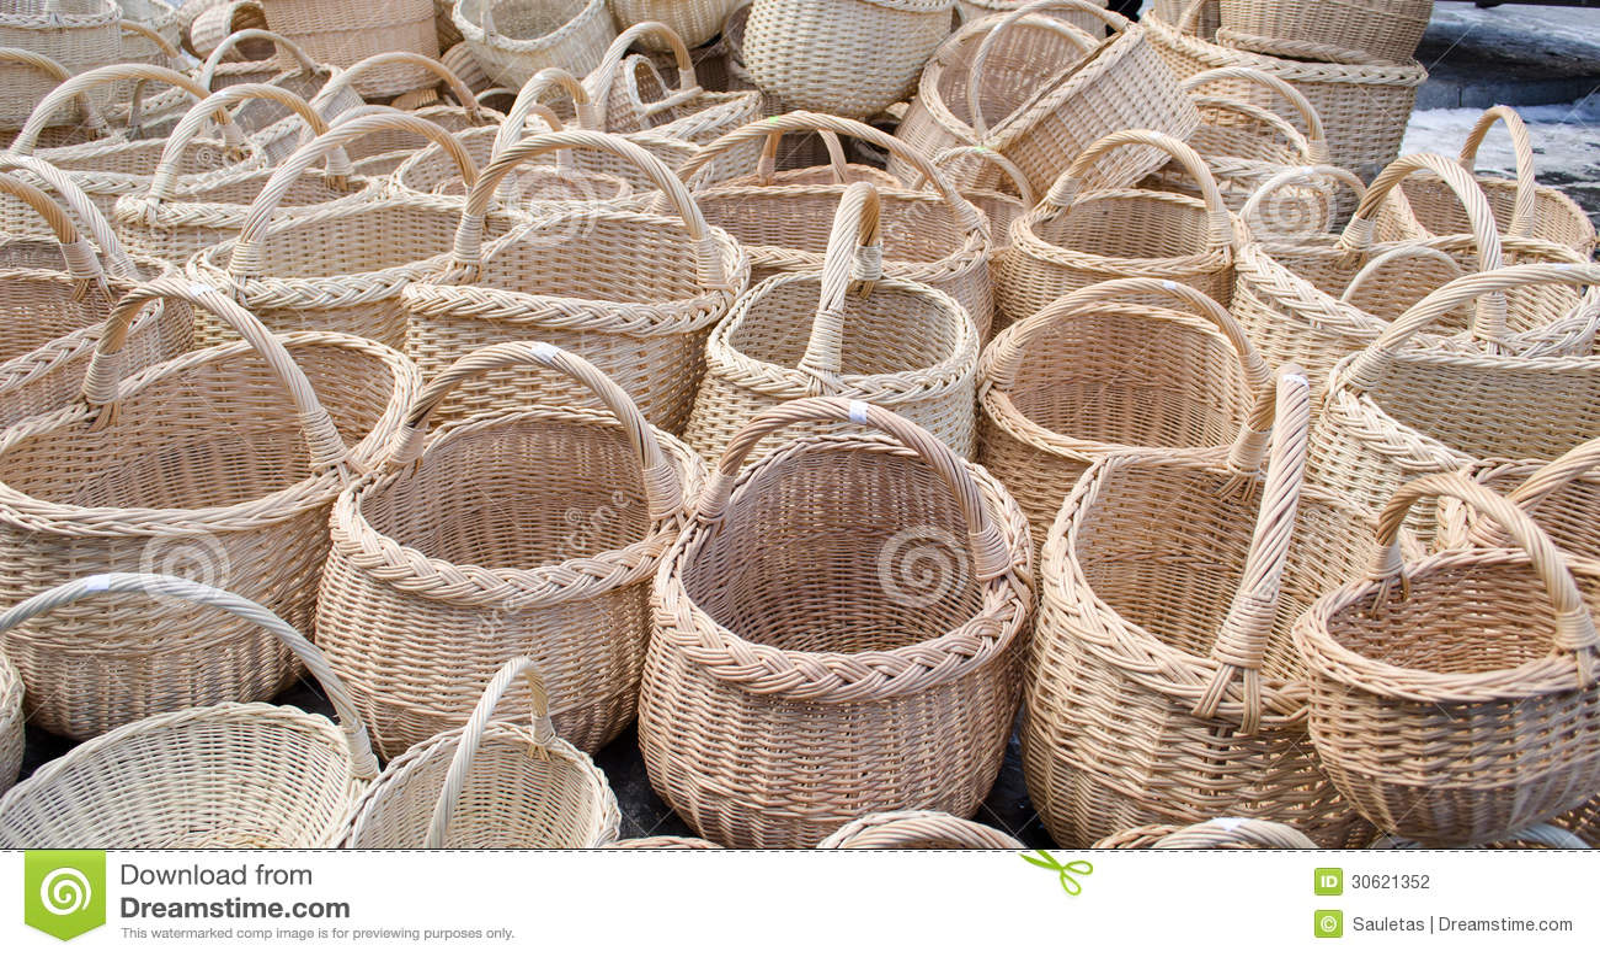 Handmade Baskets Diy : Wicker handmade wooden diy basket street market stock